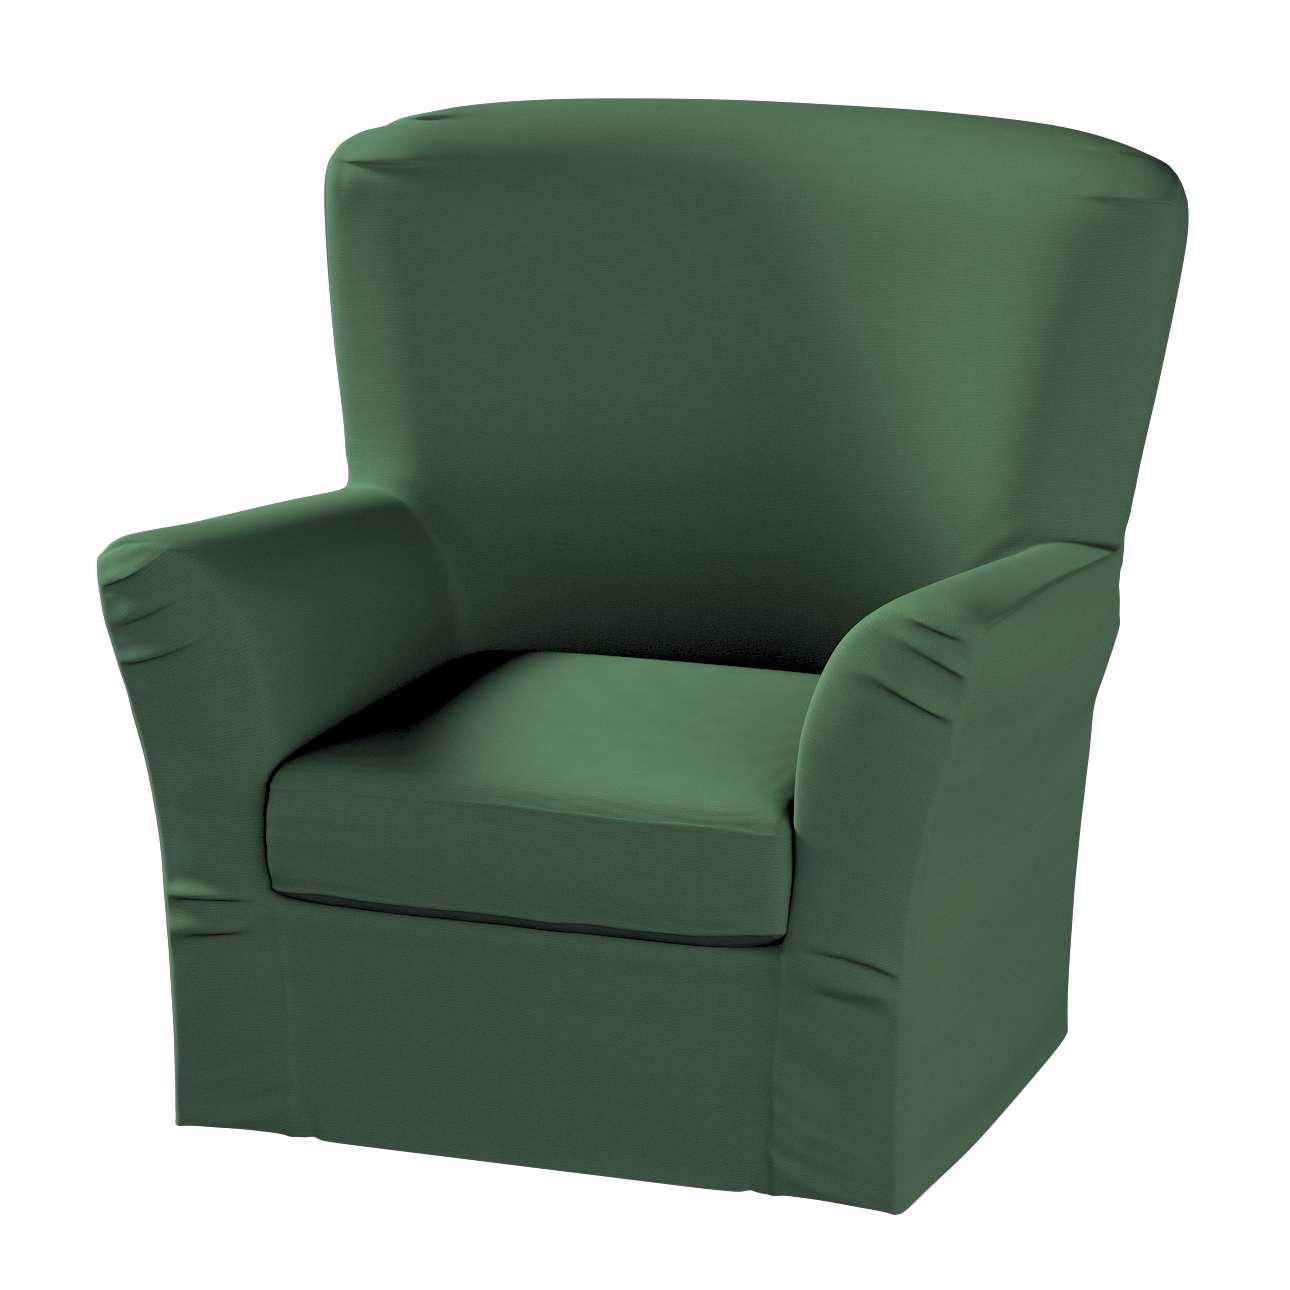 TOMELILLA fotelio užvalkalas TOMELILLA fotelis kolekcijoje Cotton Panama, audinys: 702-06